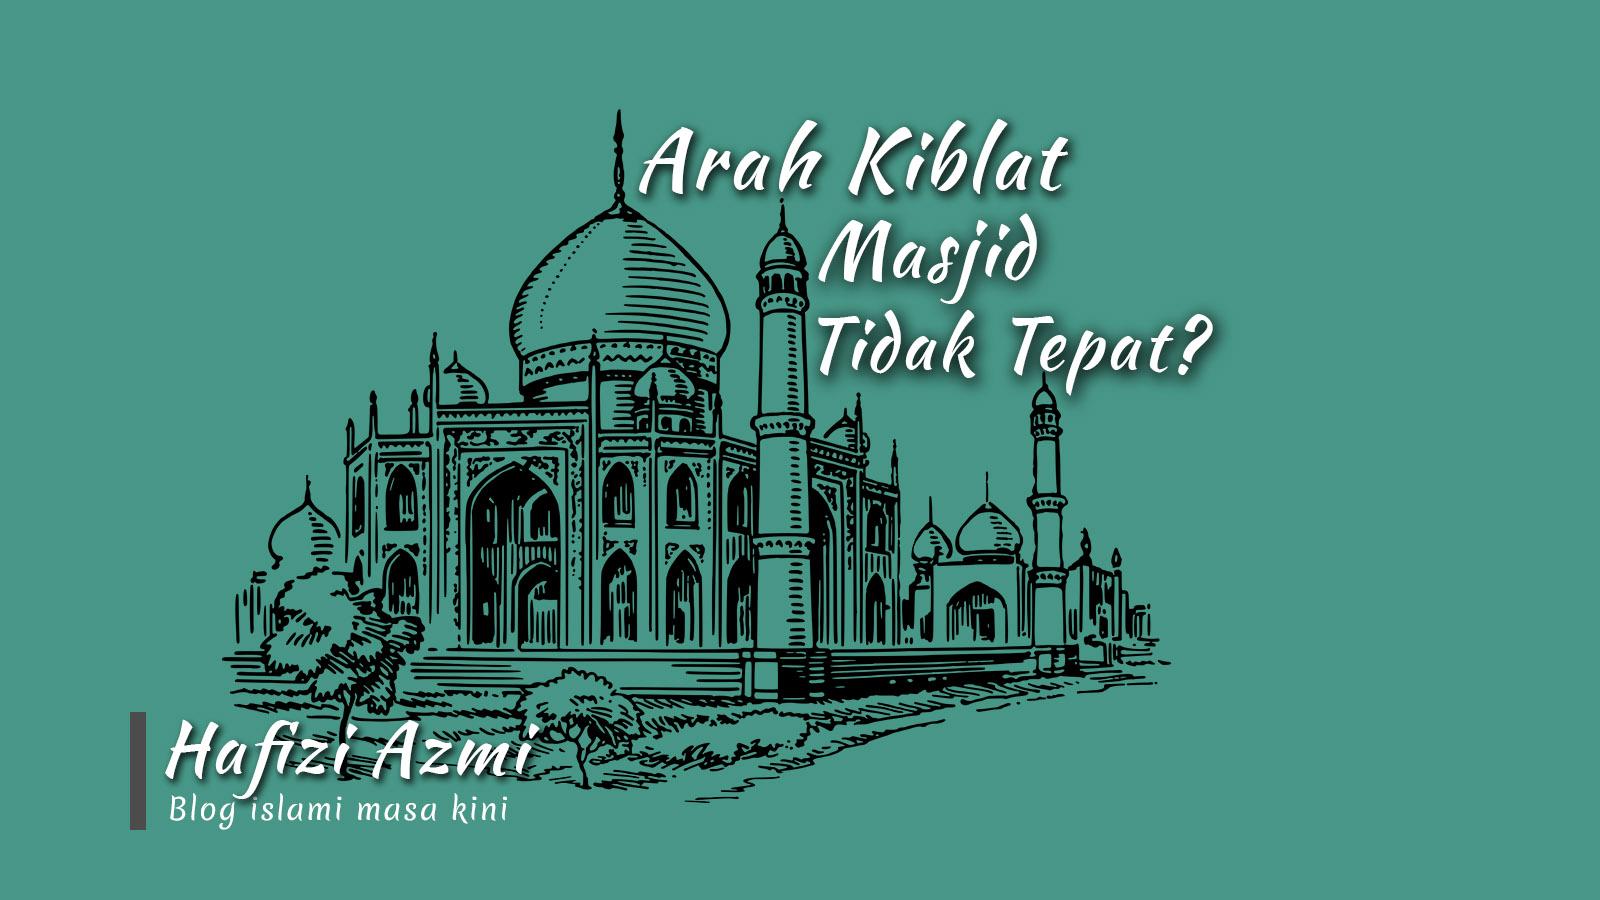 Arah Kiblat Masjid Tidak Tepat, Bagaimana Hukumnya?